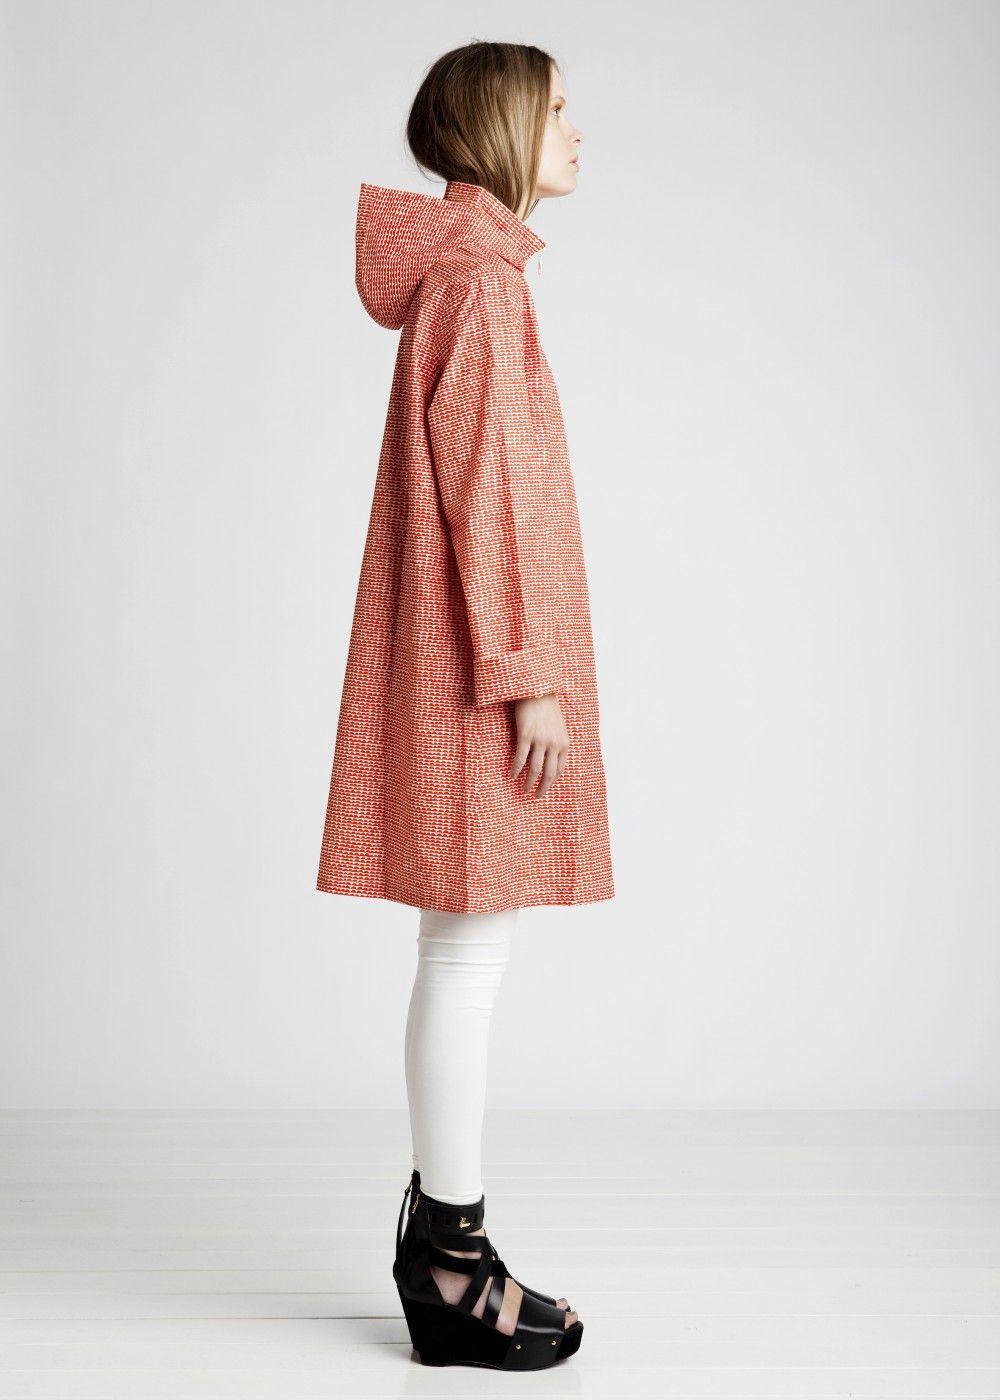 Lyle and Scott Lyle & Scott Hooded Raincoat | Wear | Pinterest ...